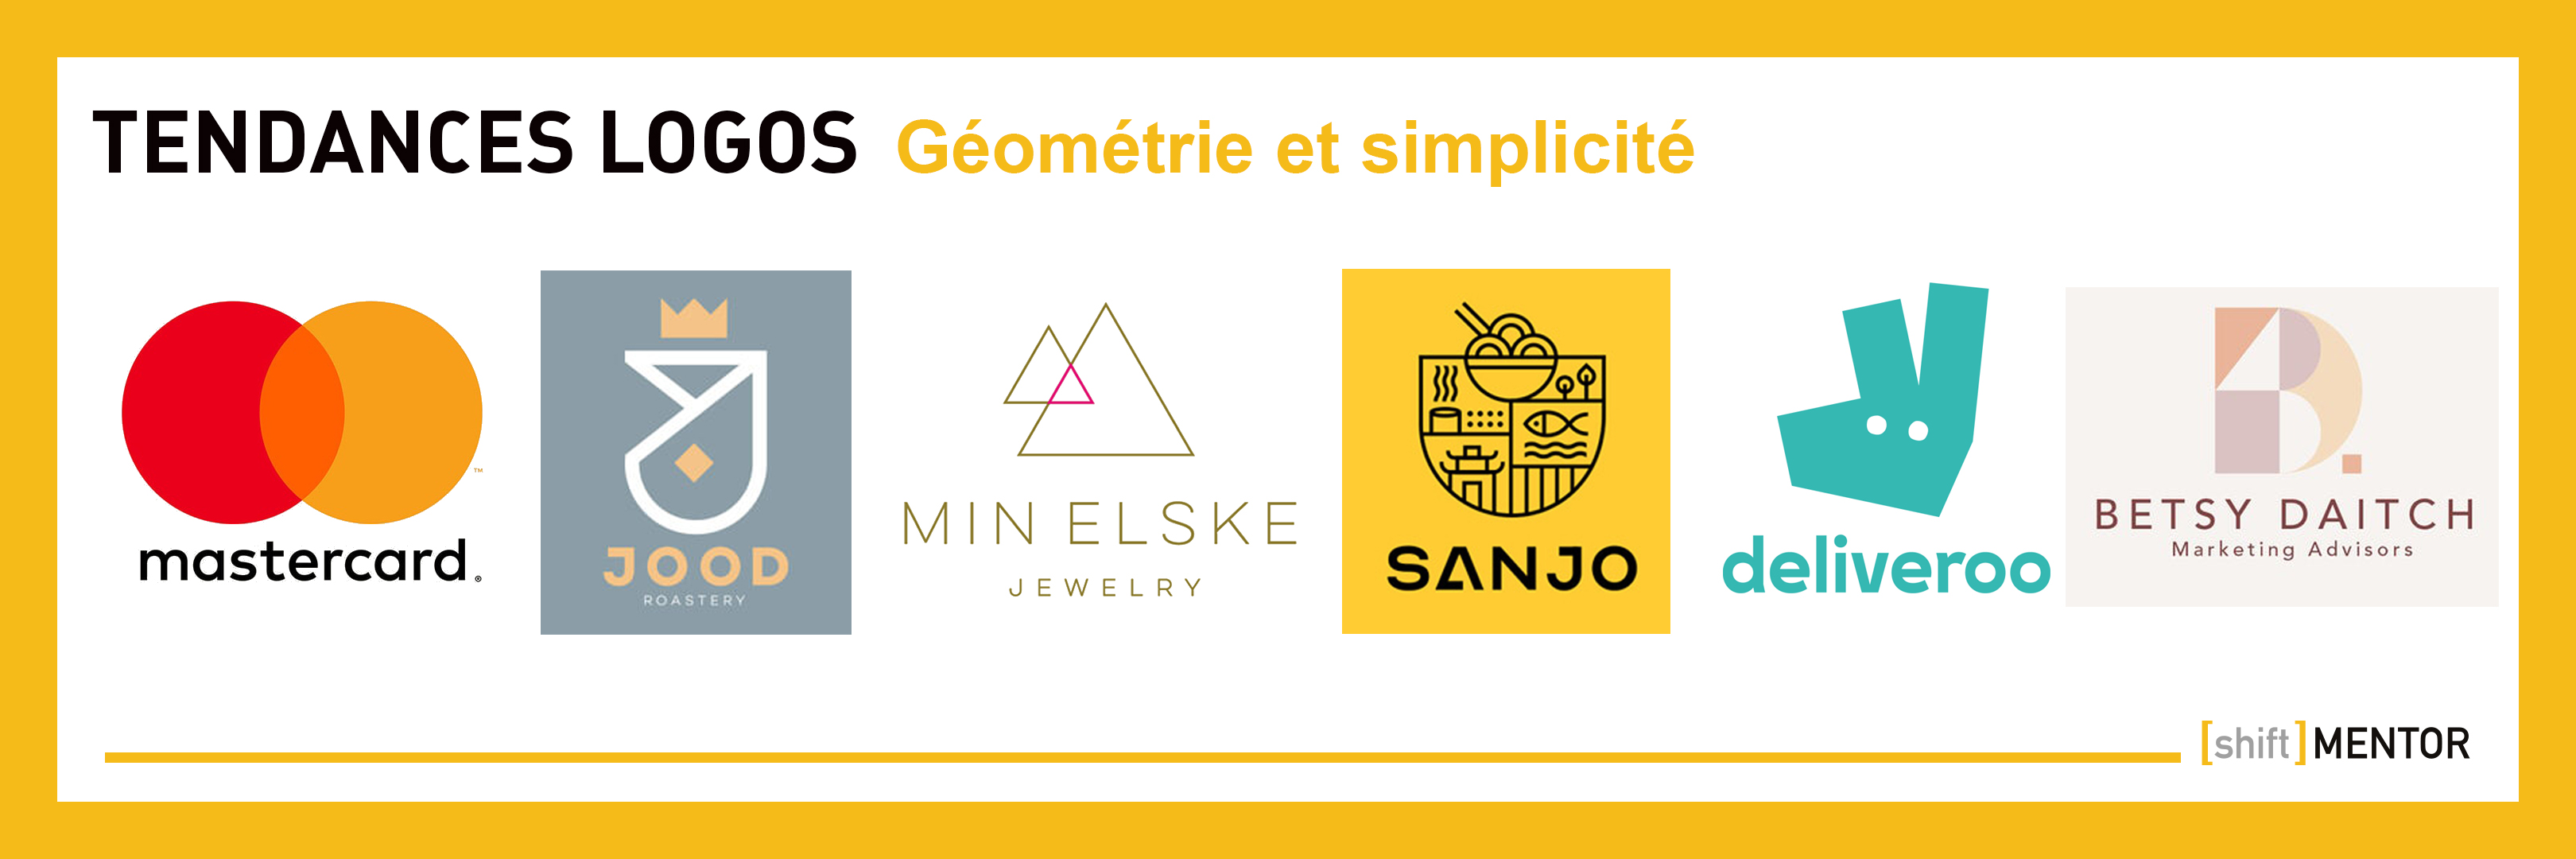 shift mentor trend geometrie simplicite